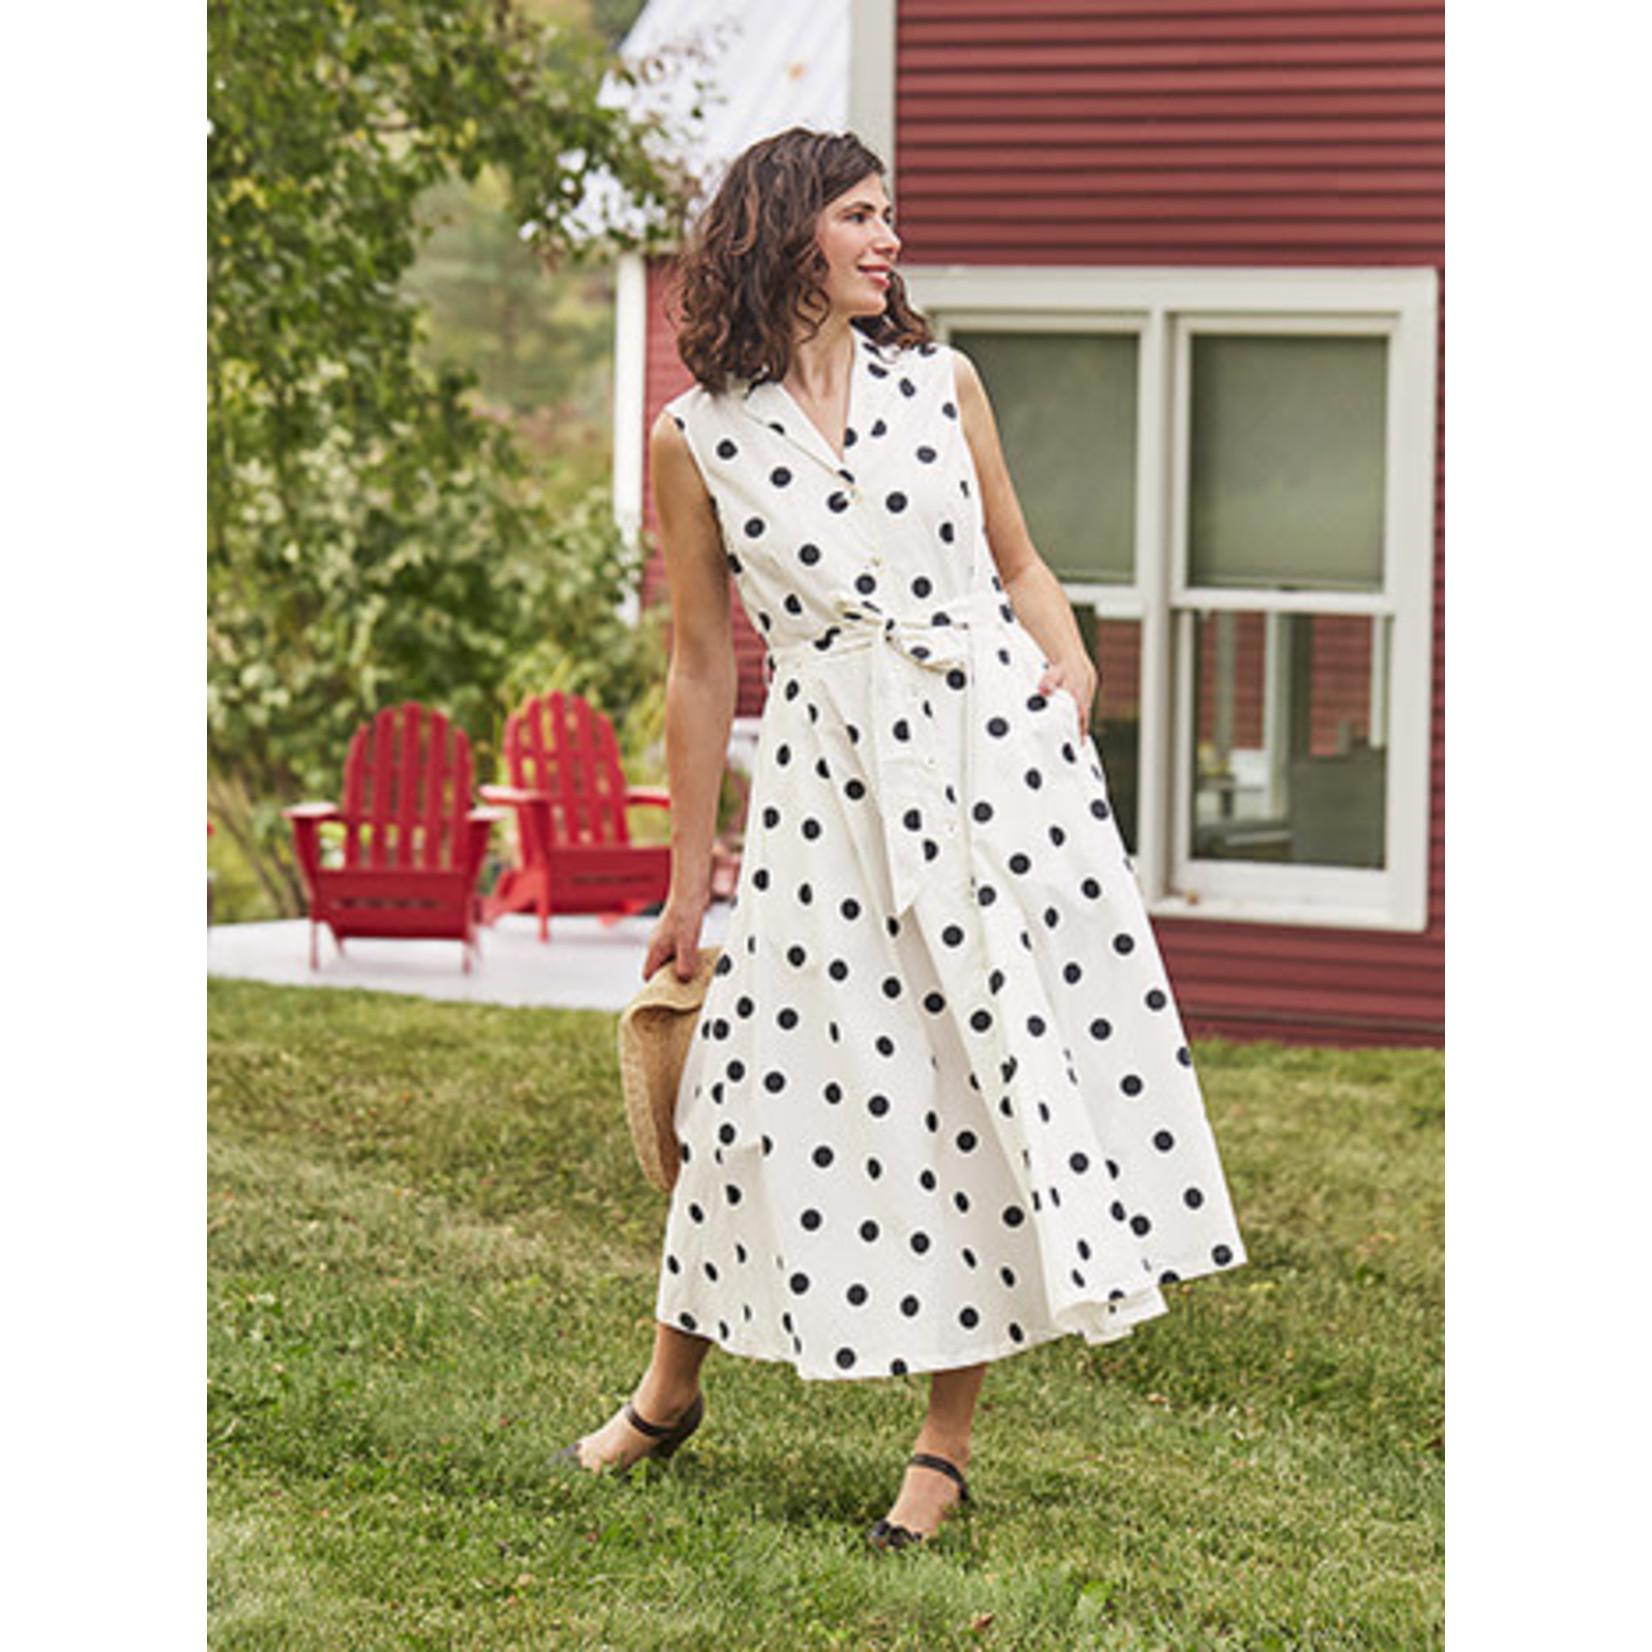 April Cornell Sadie Dot Dress